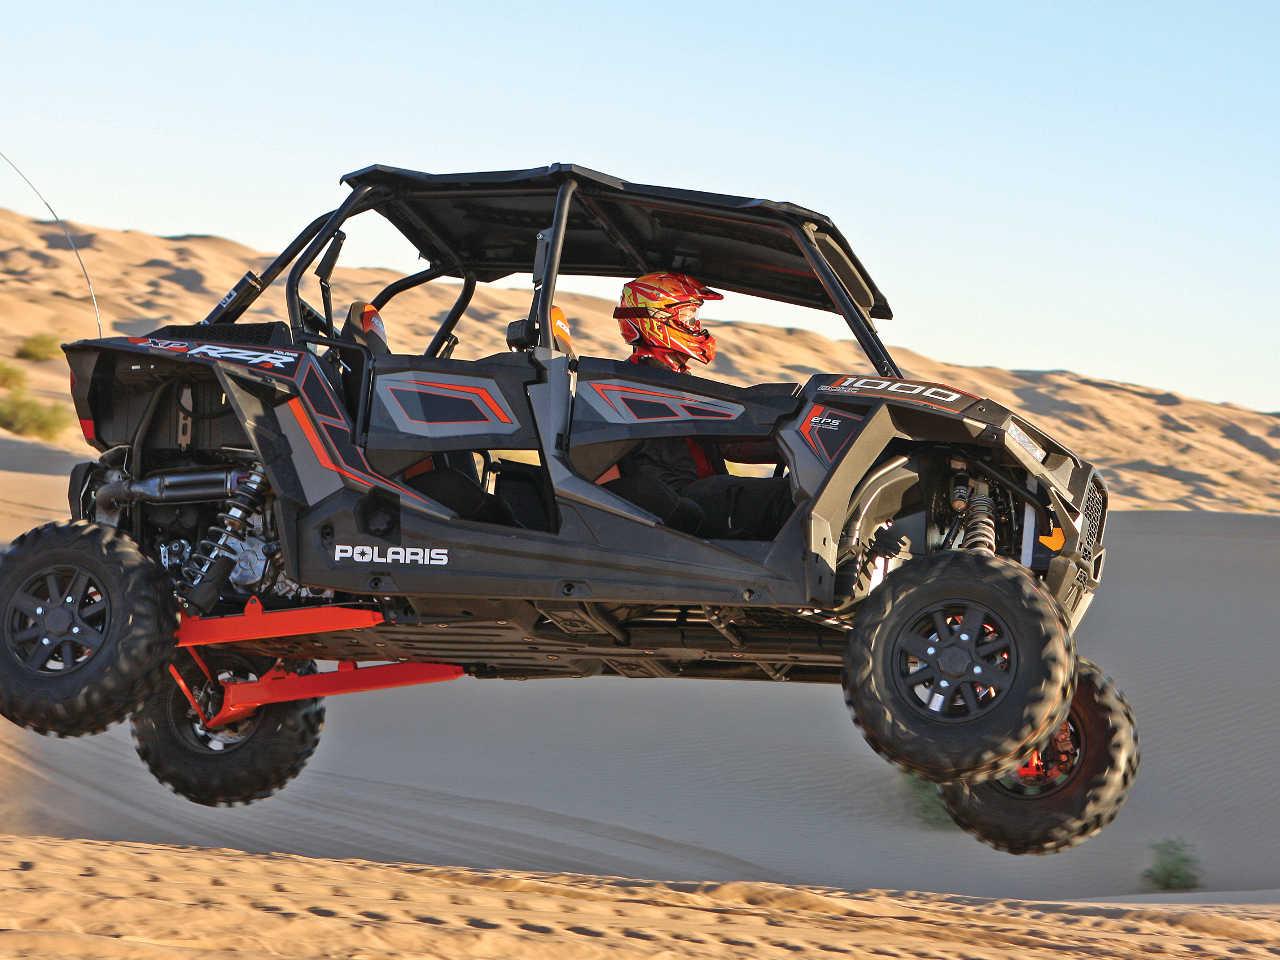 Ride Tested - The 2014 Polaris RZR XP 4 1000 EPS | ATV